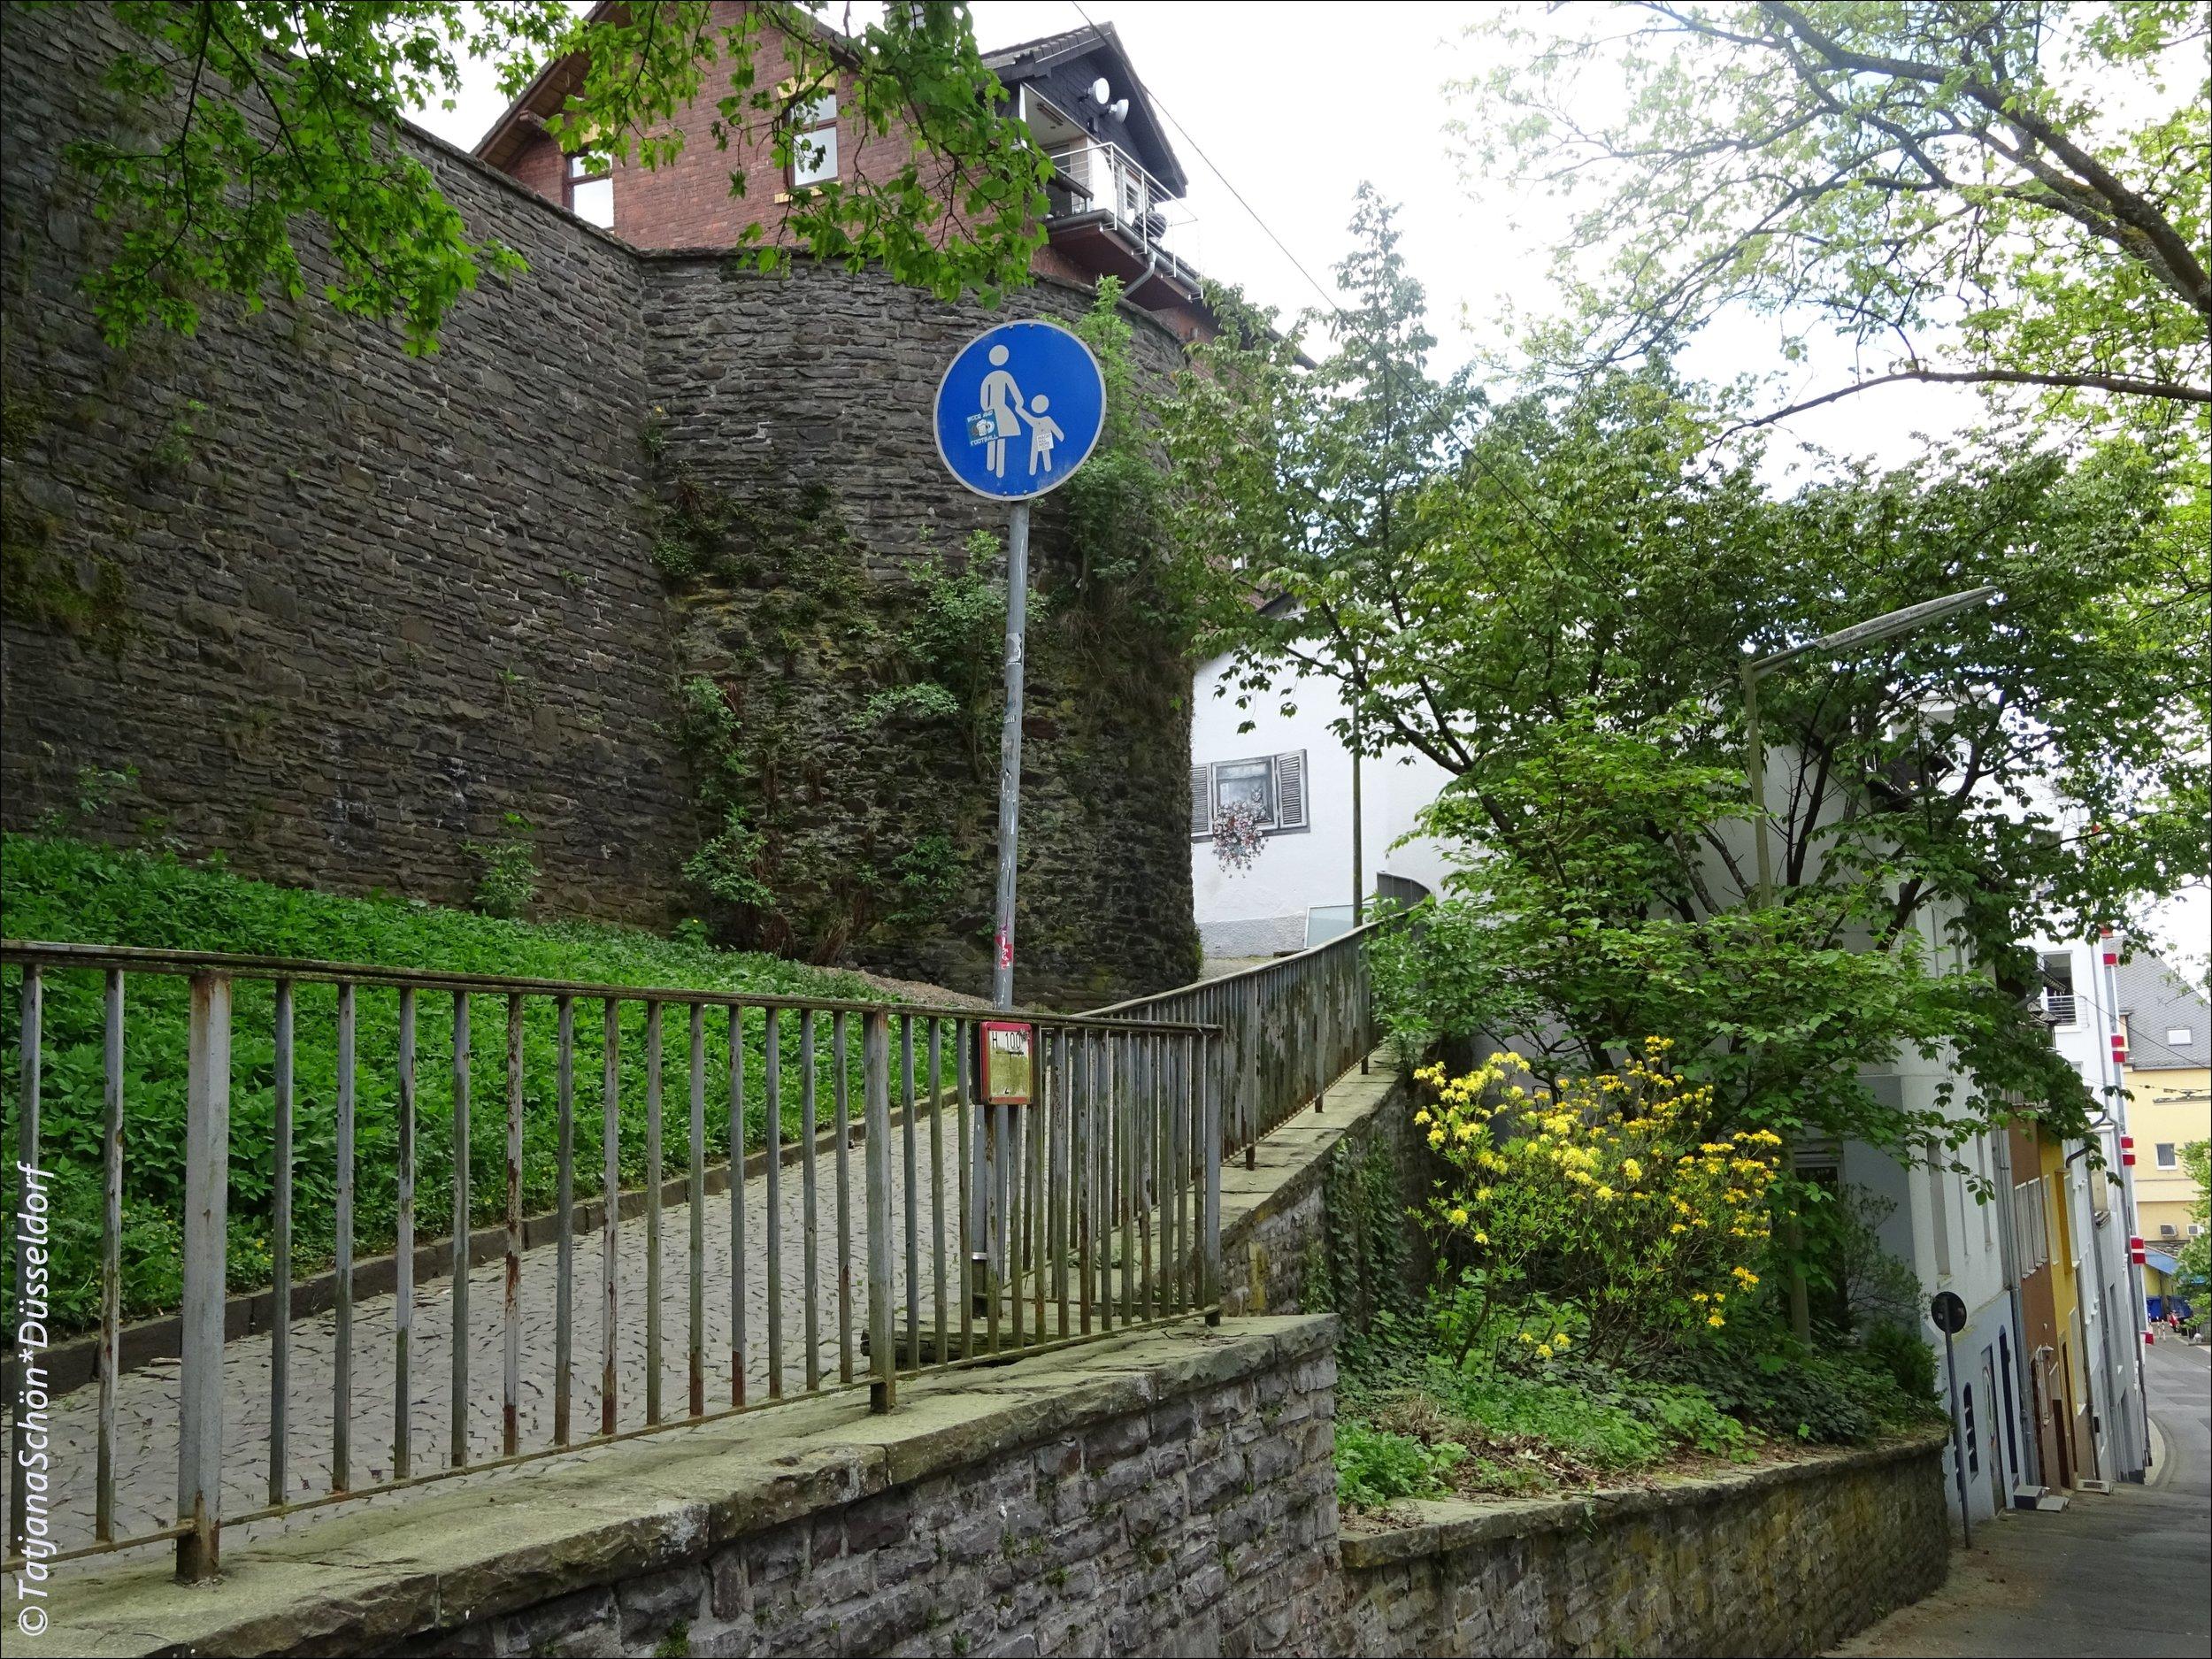 Siegen-natur34-2018.JPG